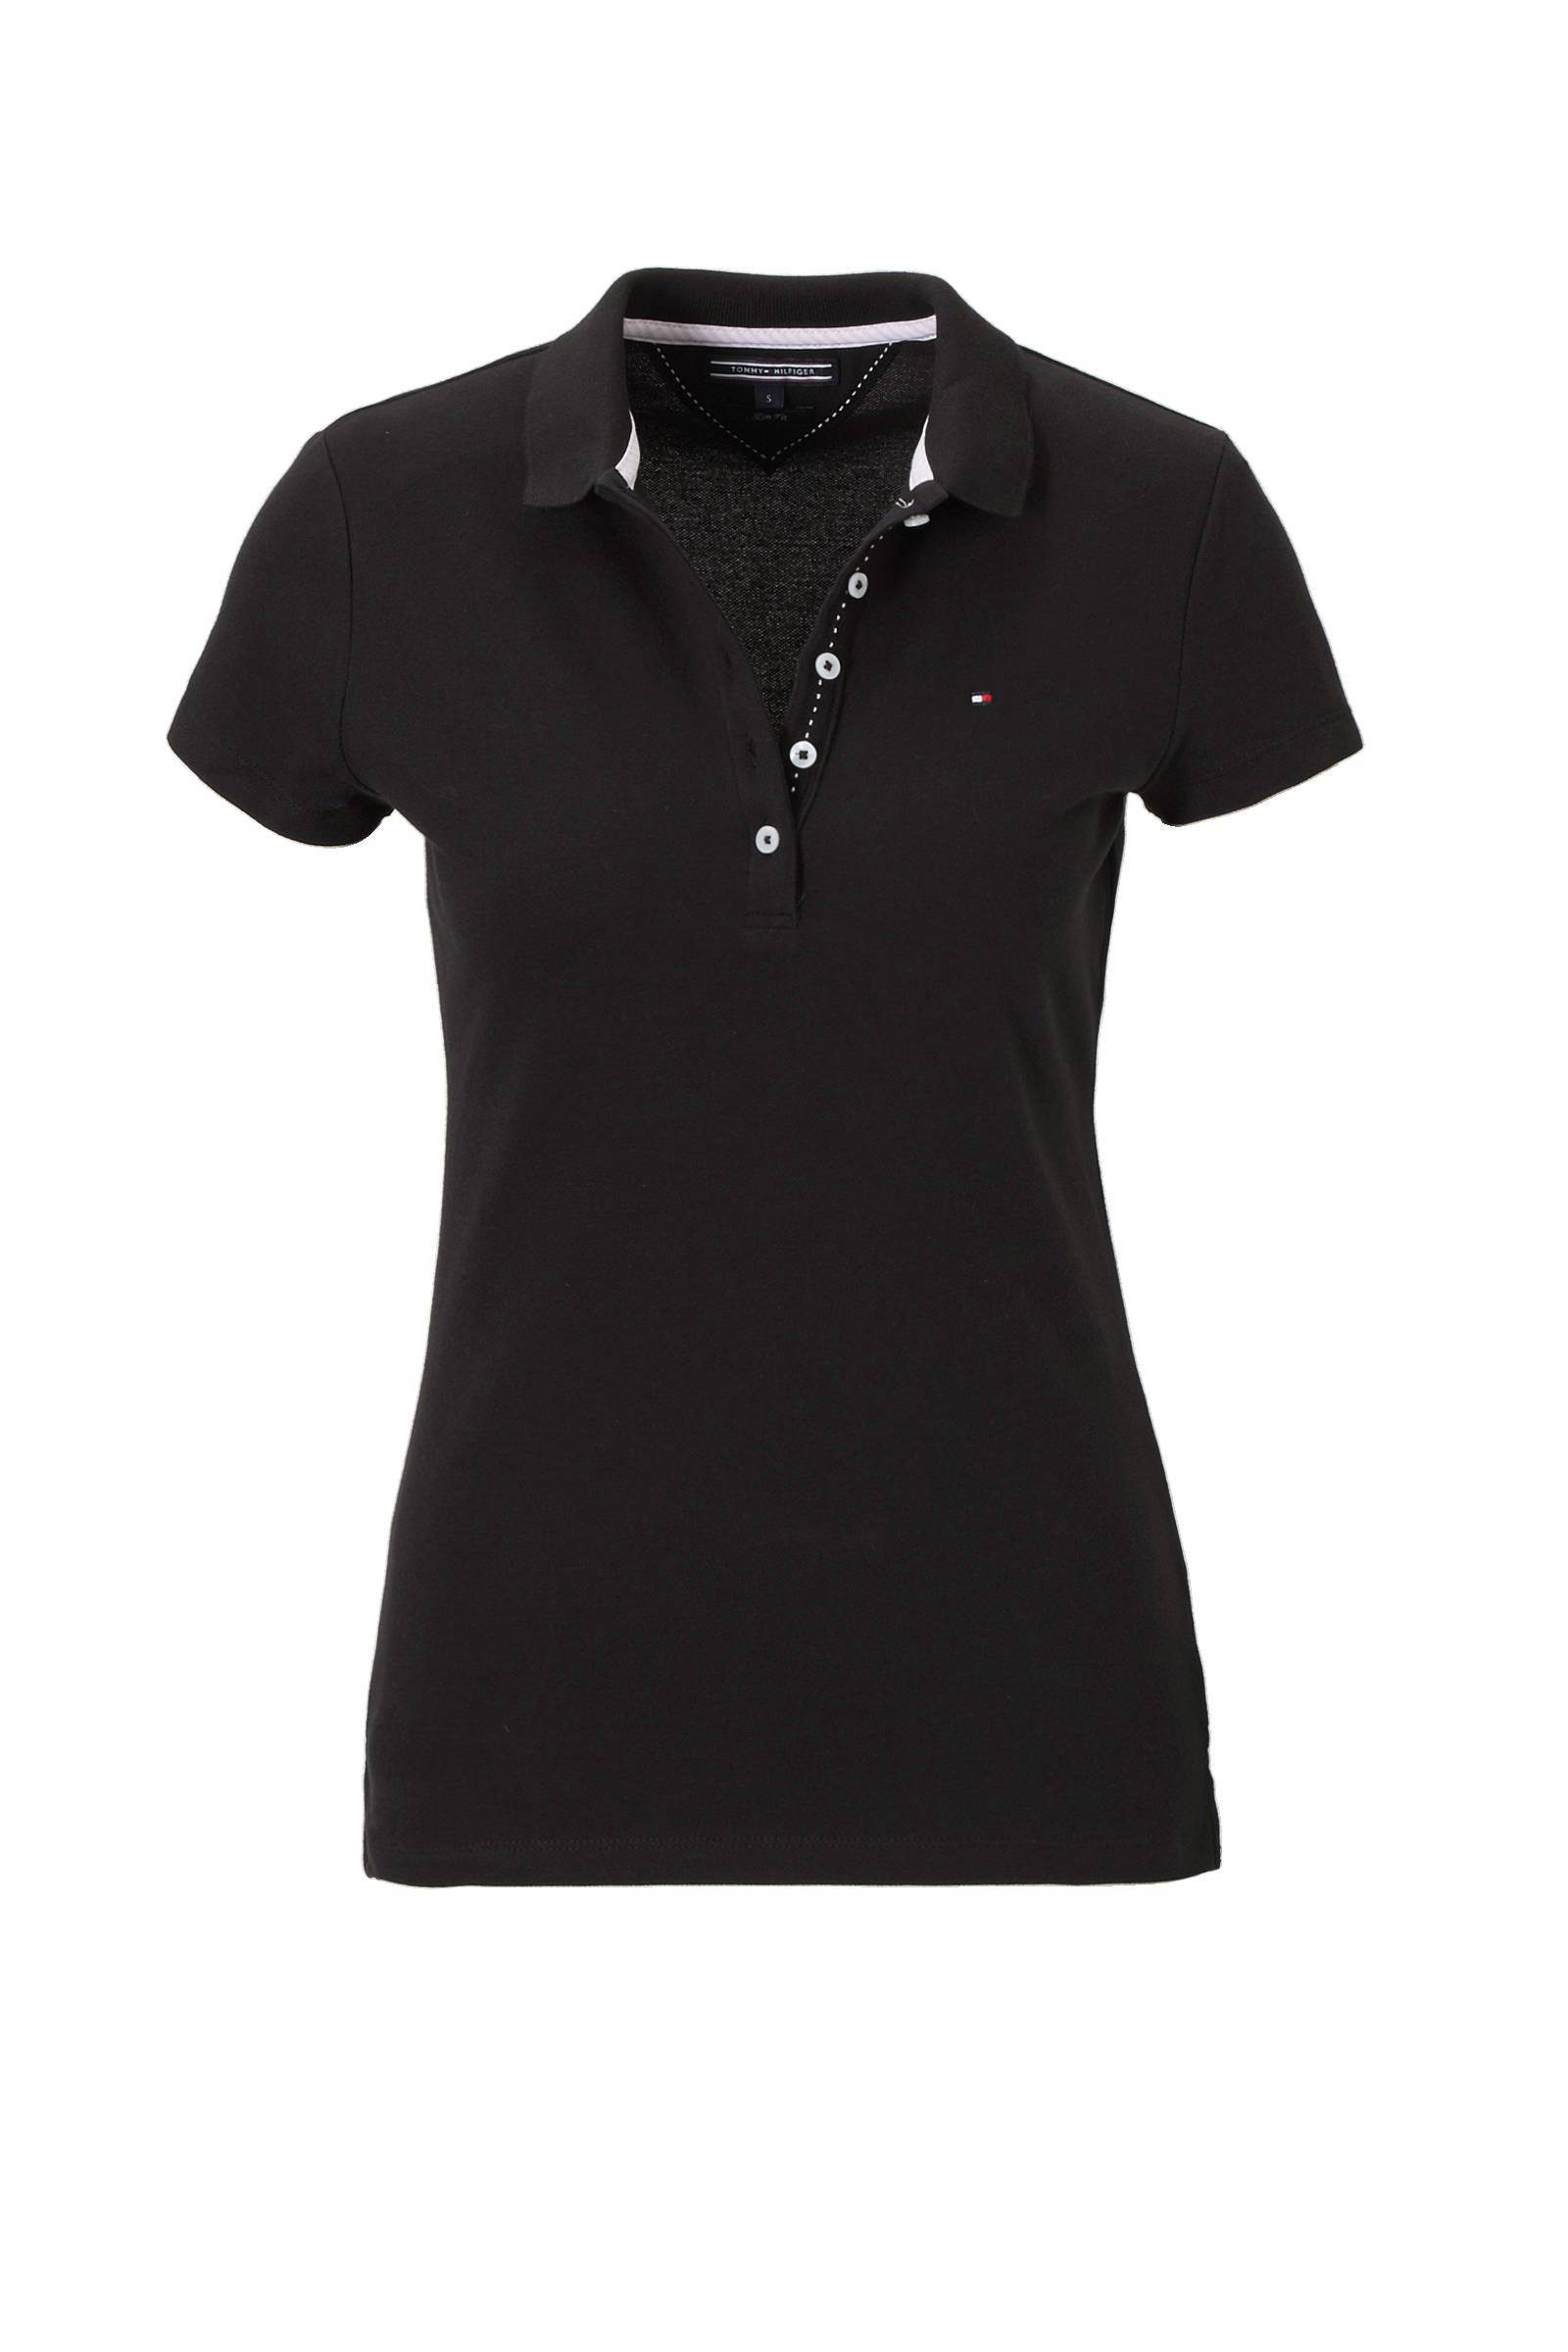 Tommy Hilfiger Polo Dames Sale baby tshirt.nl